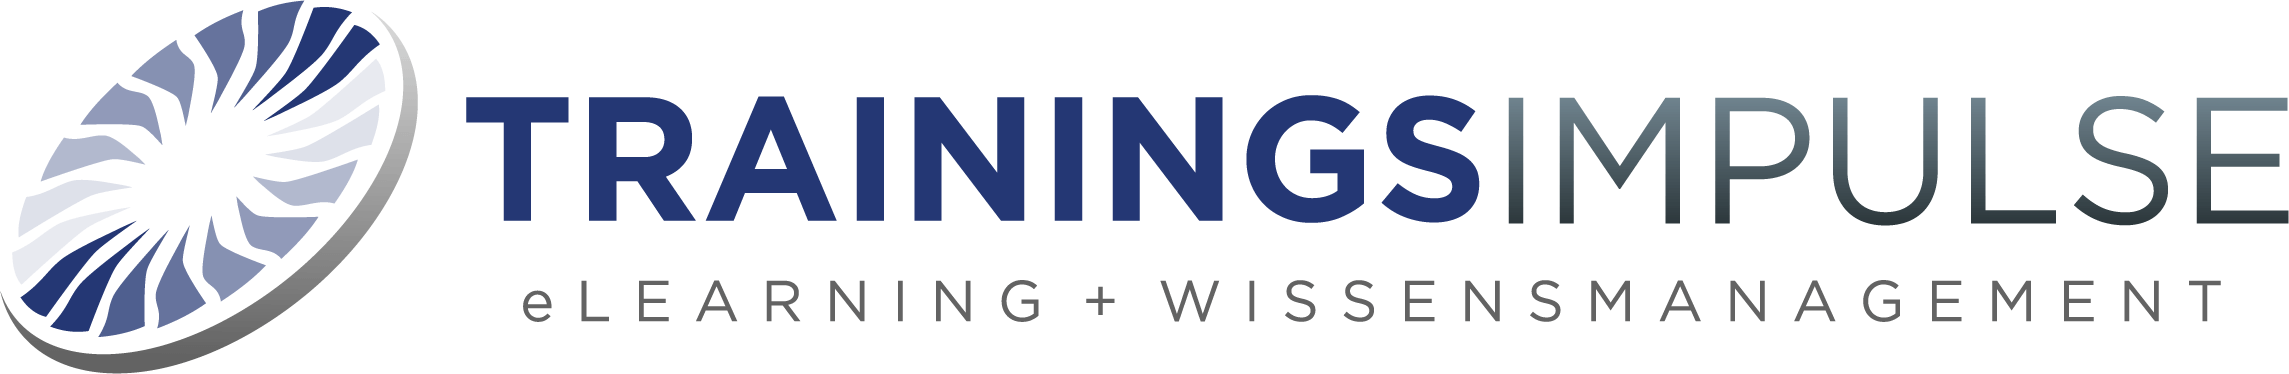 TrainingsImpulse E-Learnings zur EN 9100, zum EASA Part 21 (Luftrecht), Human Factors